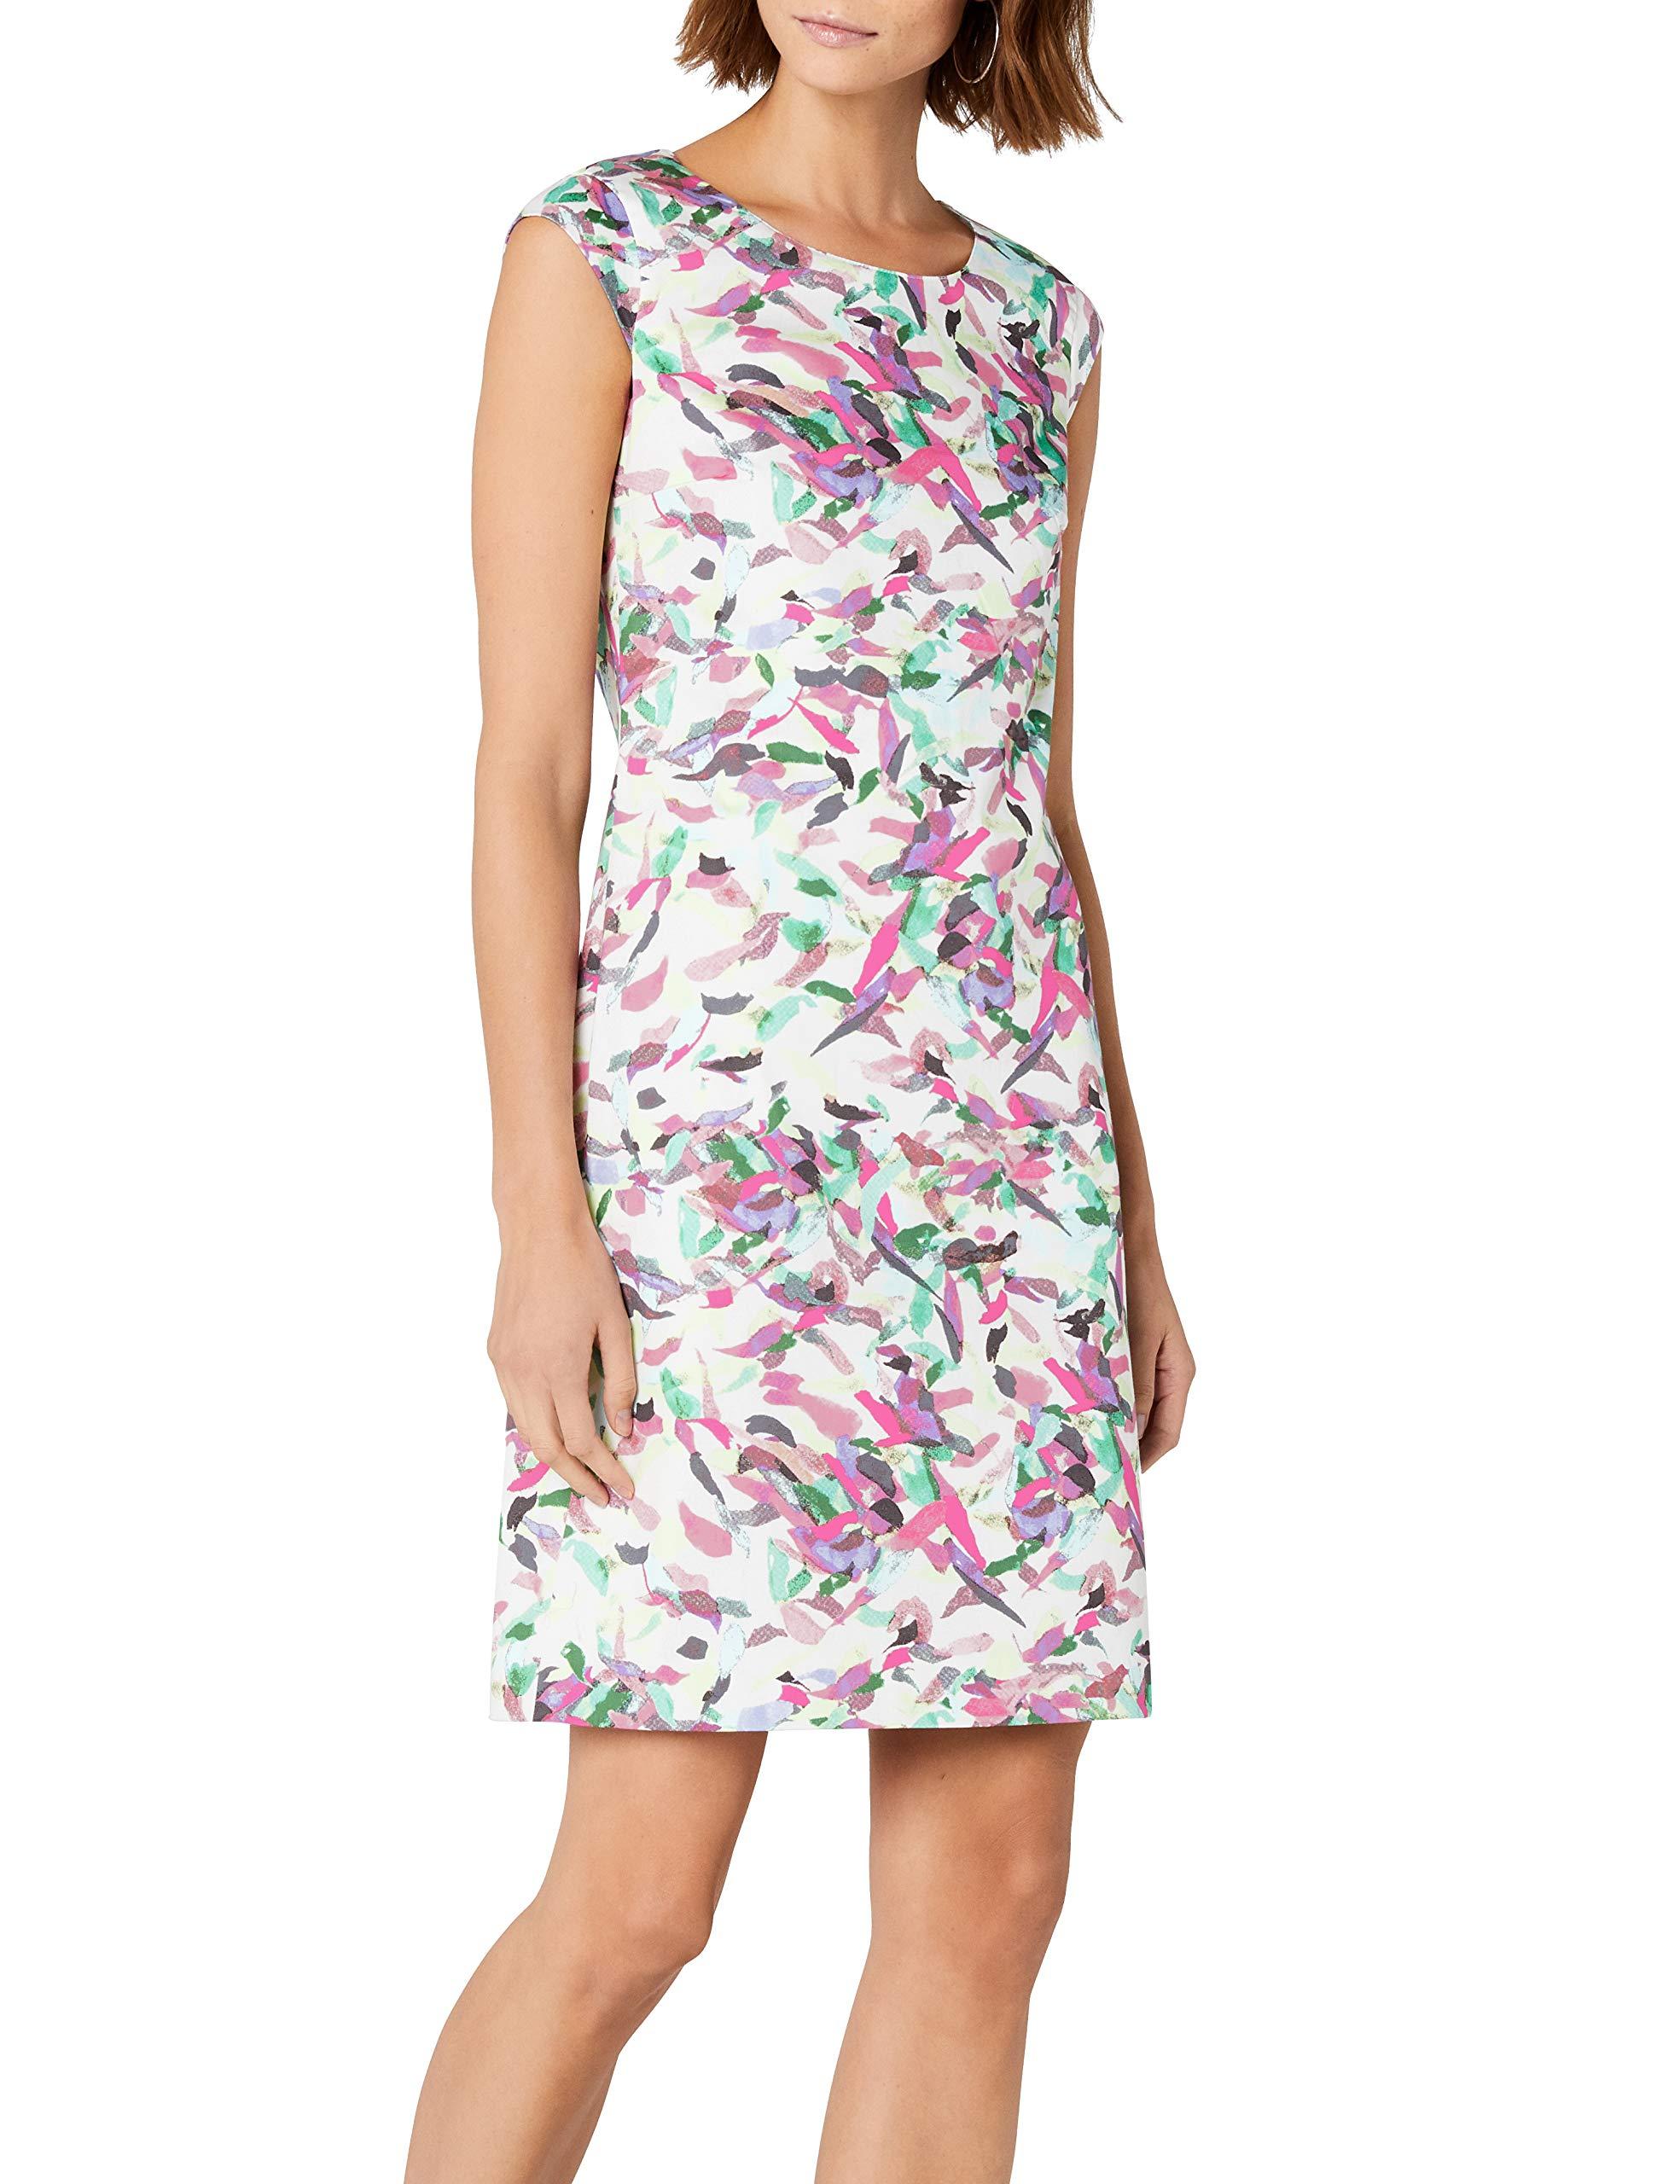 Femme Lavender Robe Moreamp;Kleid Multicolor 3810Taille34 Multicoloresoft Rjq35Sc4AL